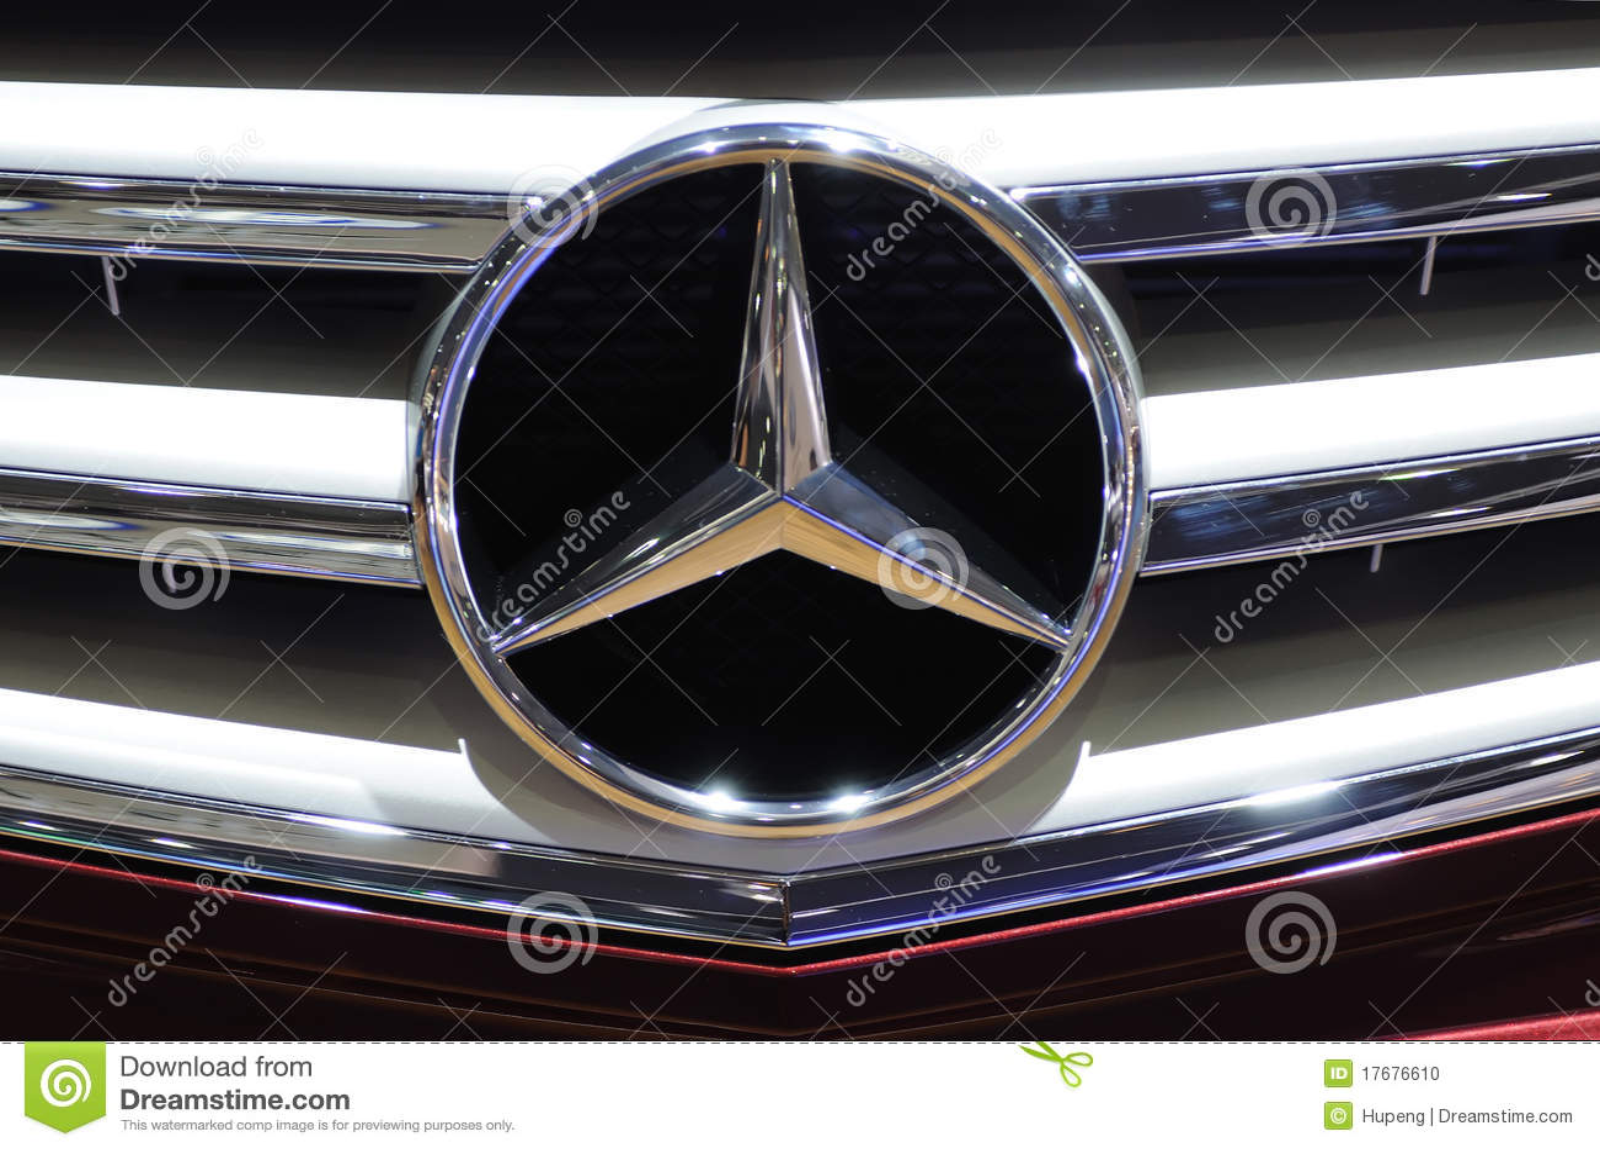 Benz logo Mercedes